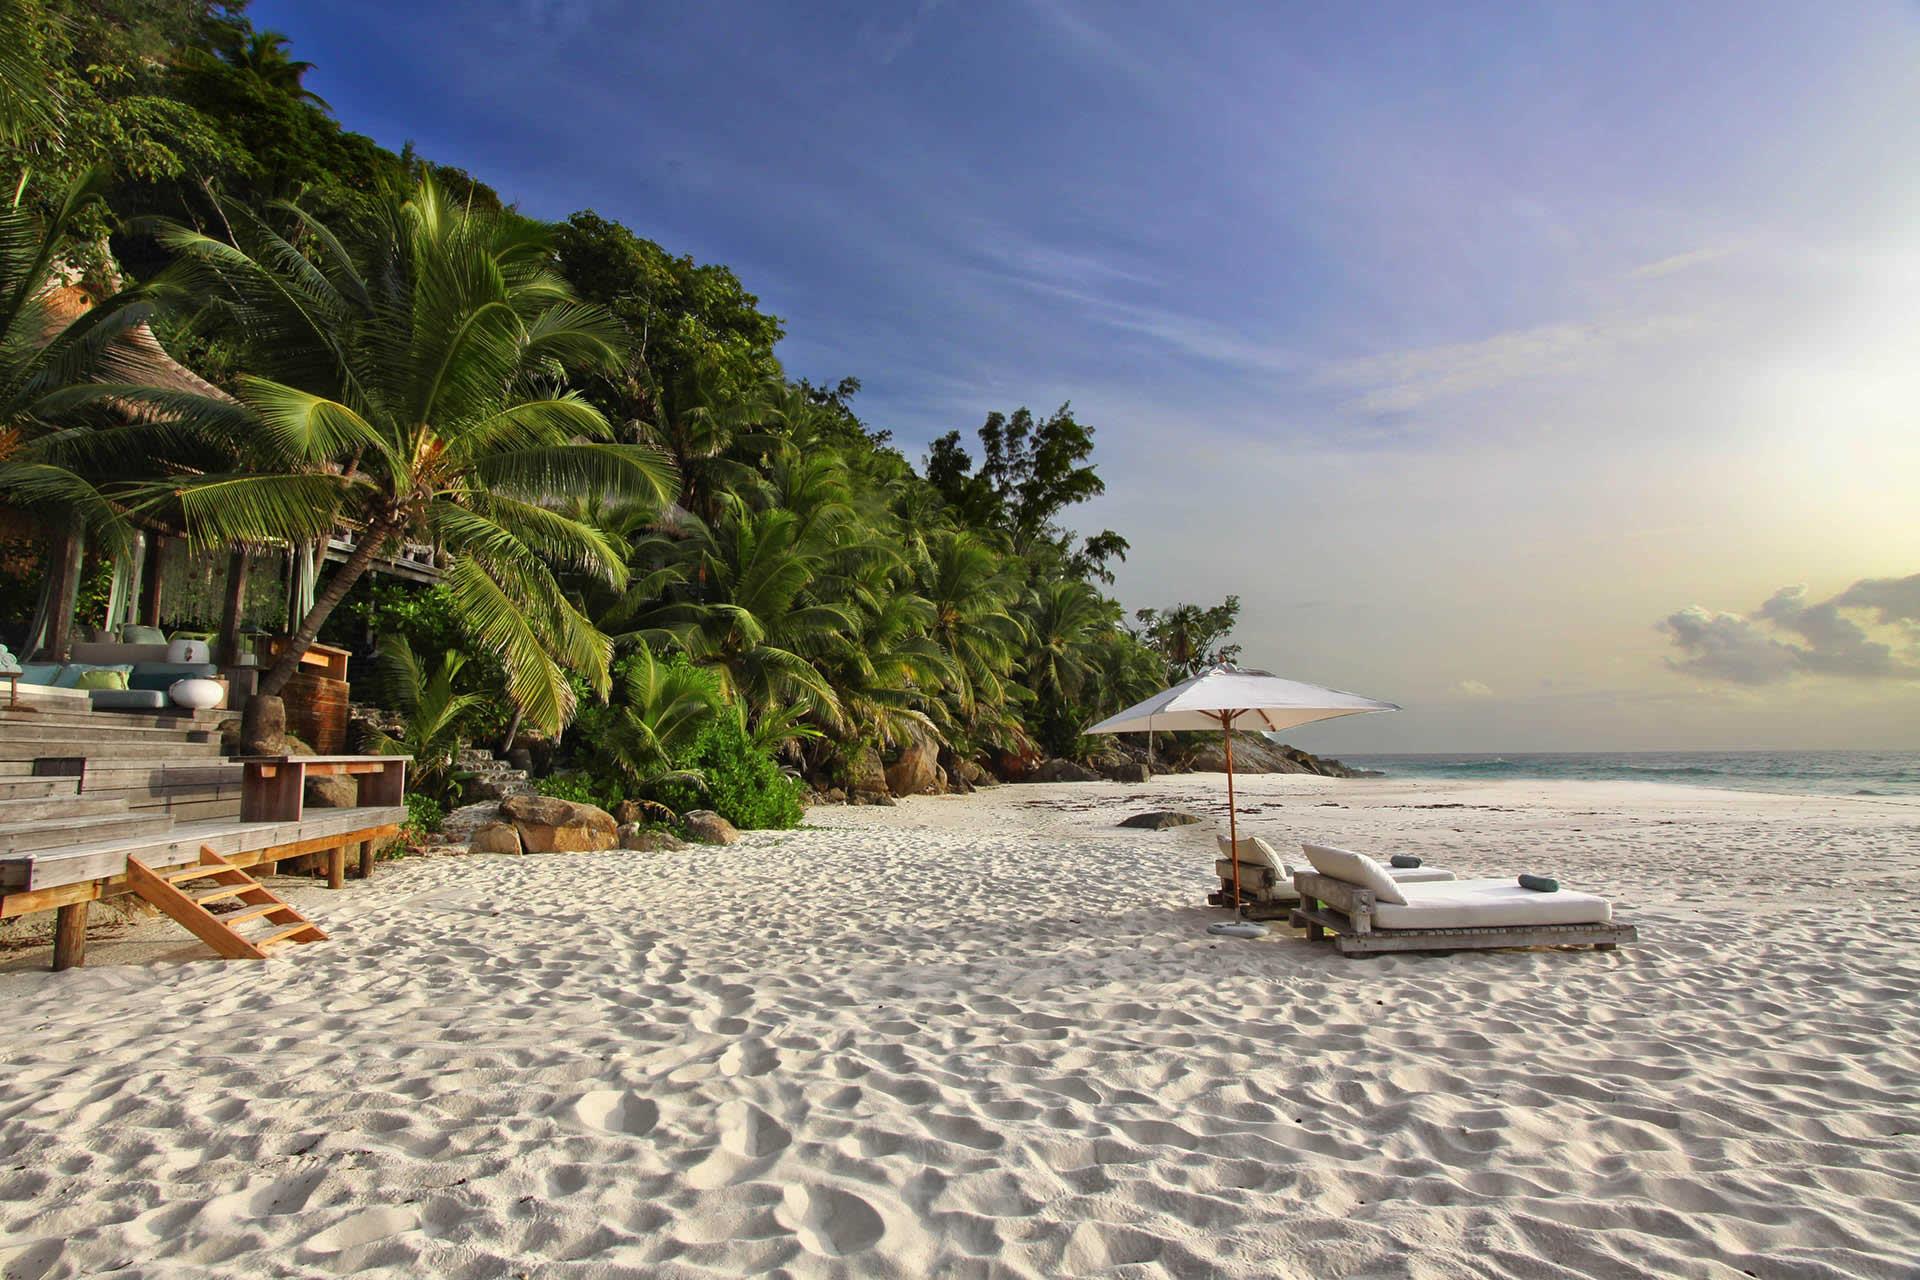 seychelles beaches wildlife scuba diving  island hopping